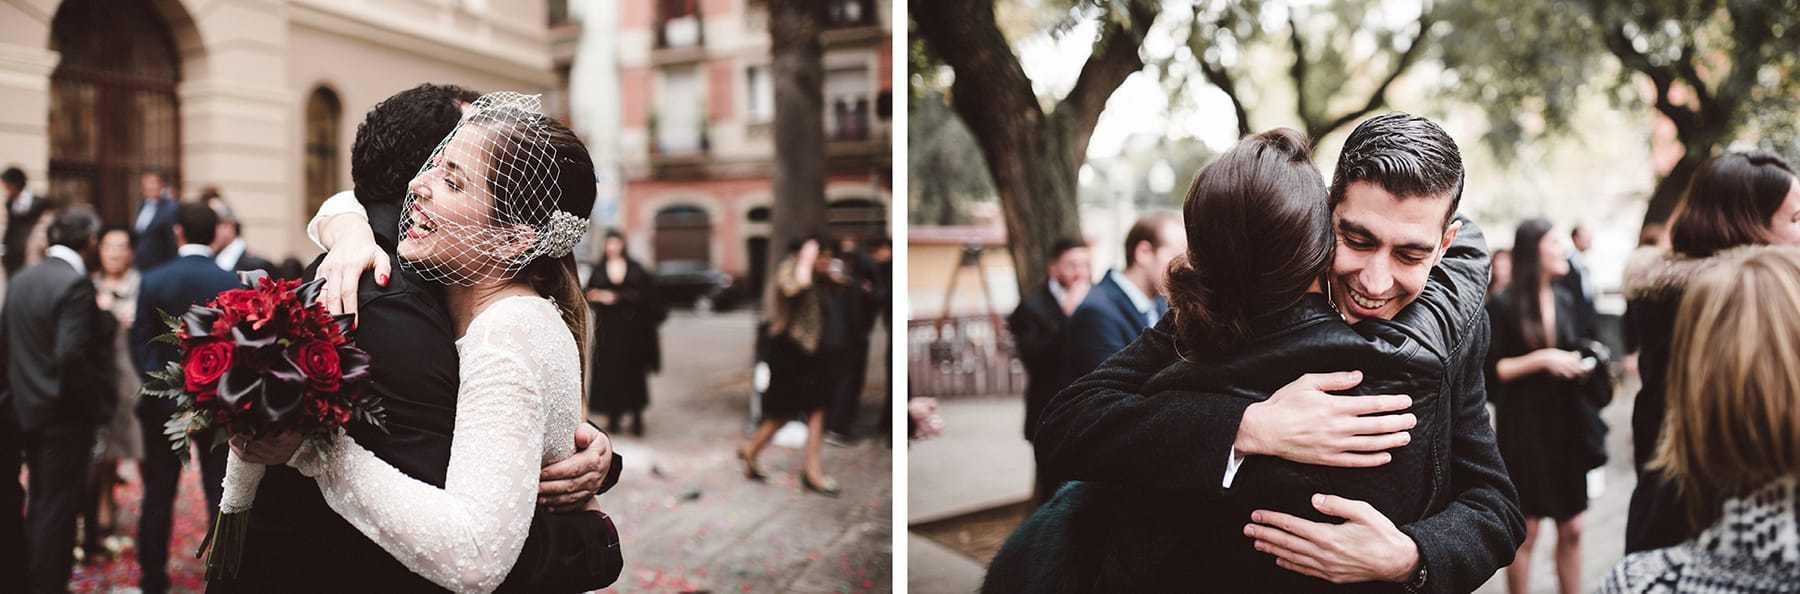 vestido_de_novia_otaduy_hilario_sanchez_fotografo_boda_barcelona_073